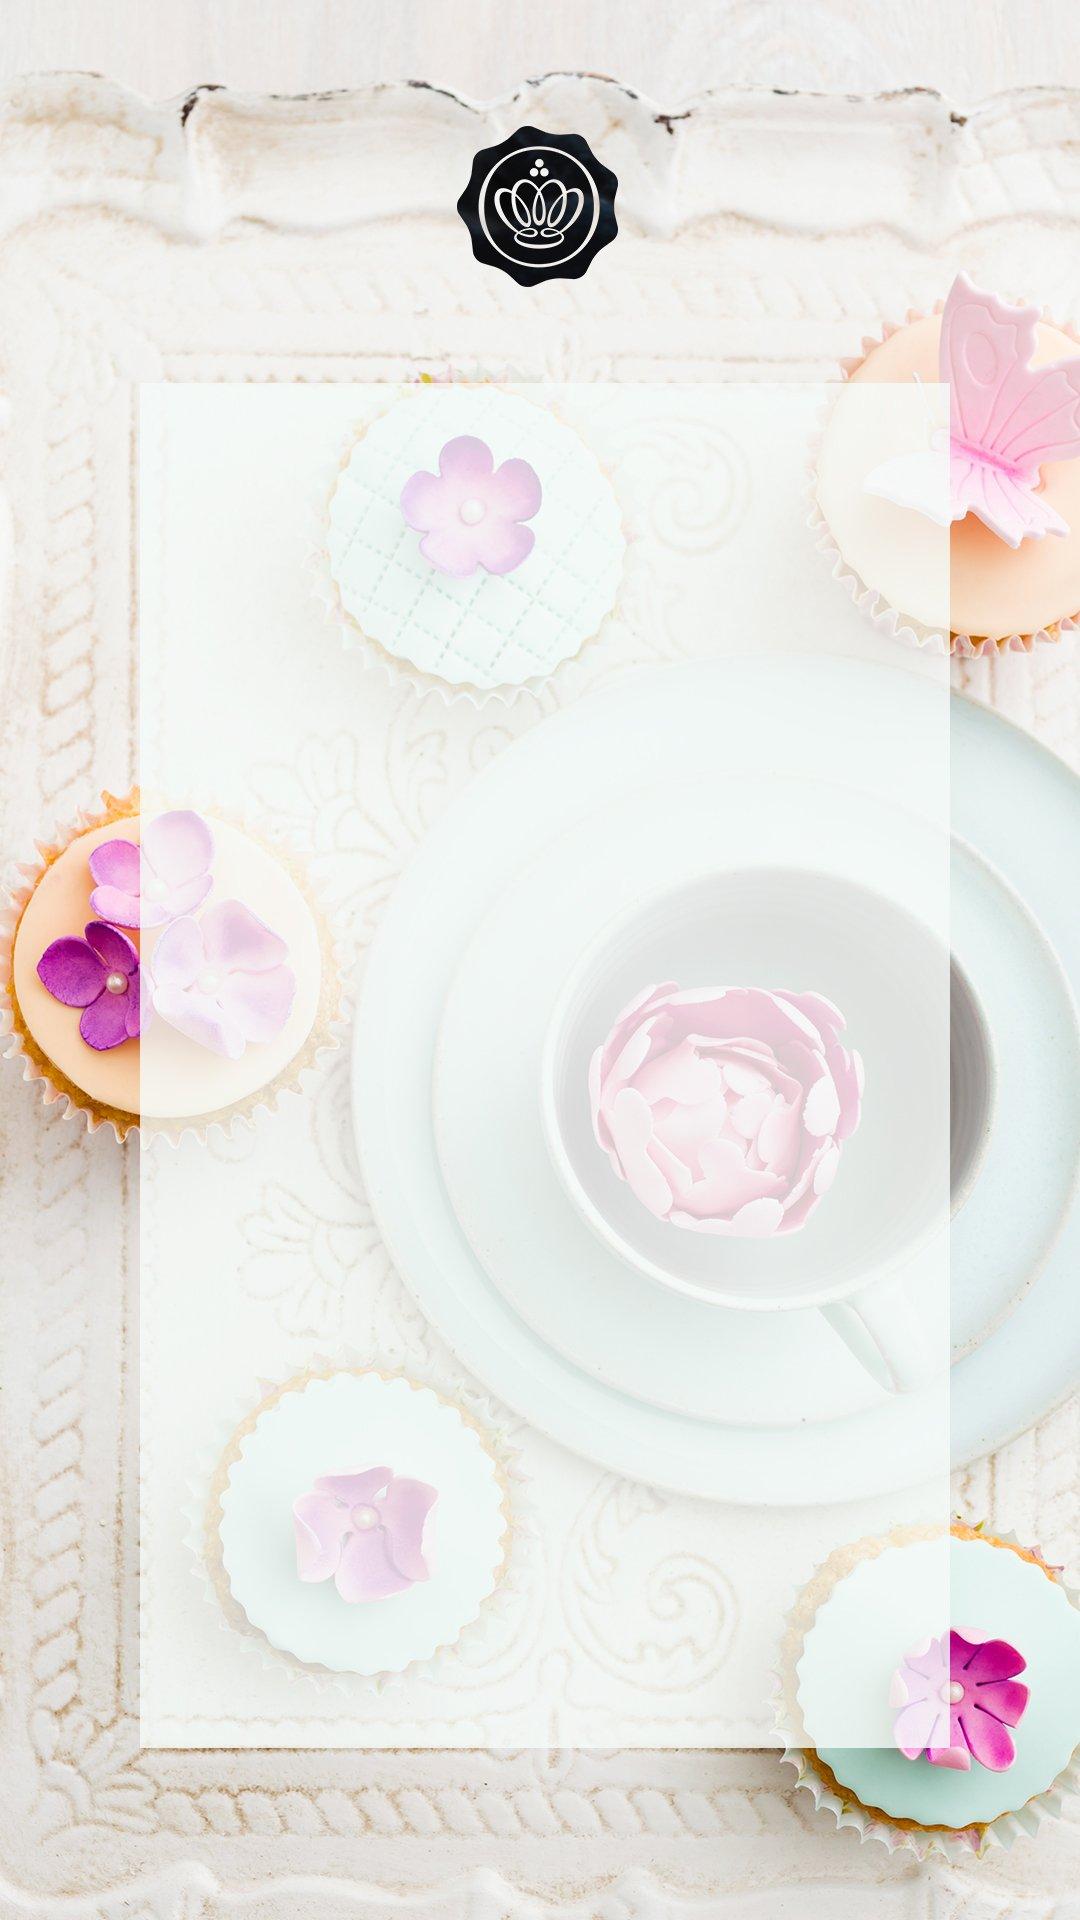 glossybox-wallpaper-maerz-screensaver-smartphone-pretty-pleasures